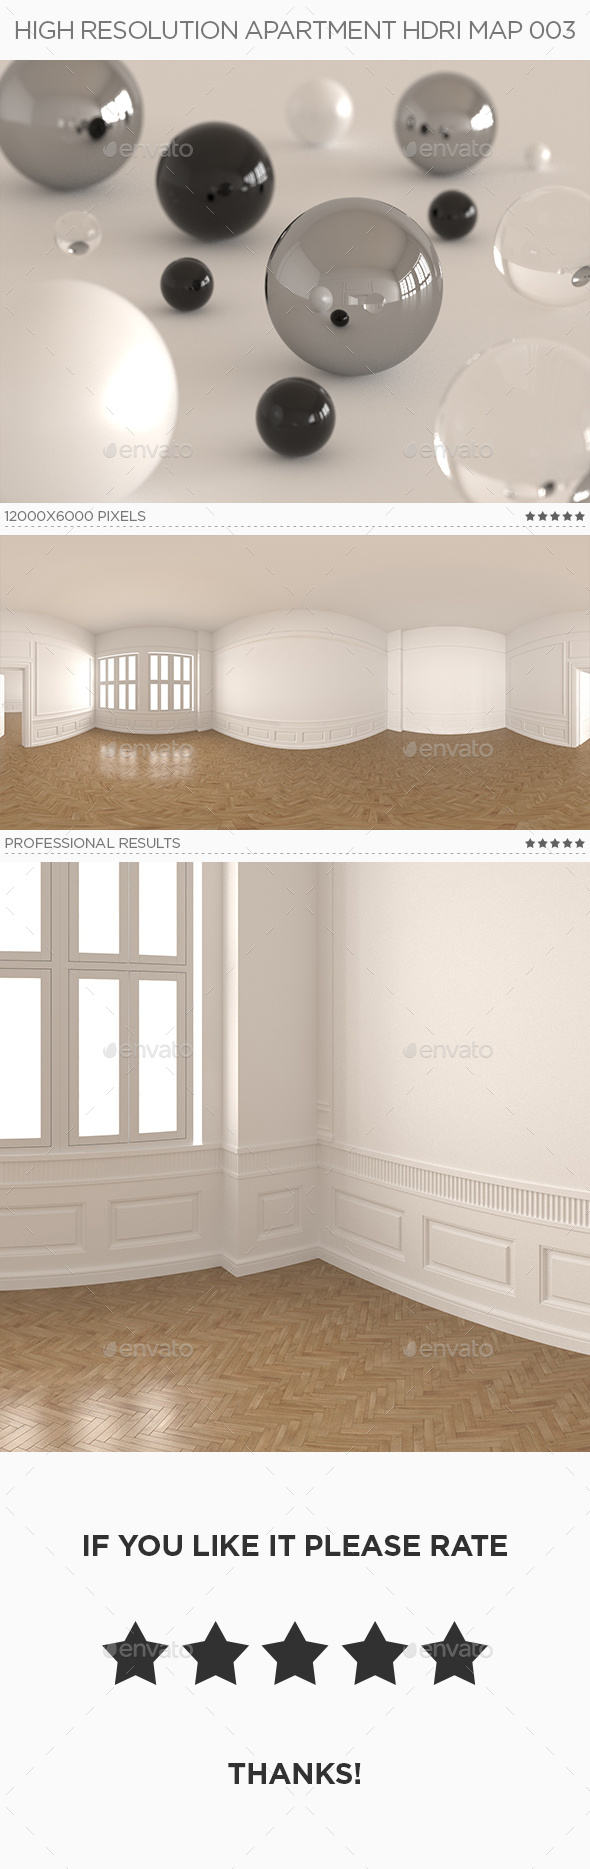 3DOcean High Resolution Apartment HDRi Map 003 18999513